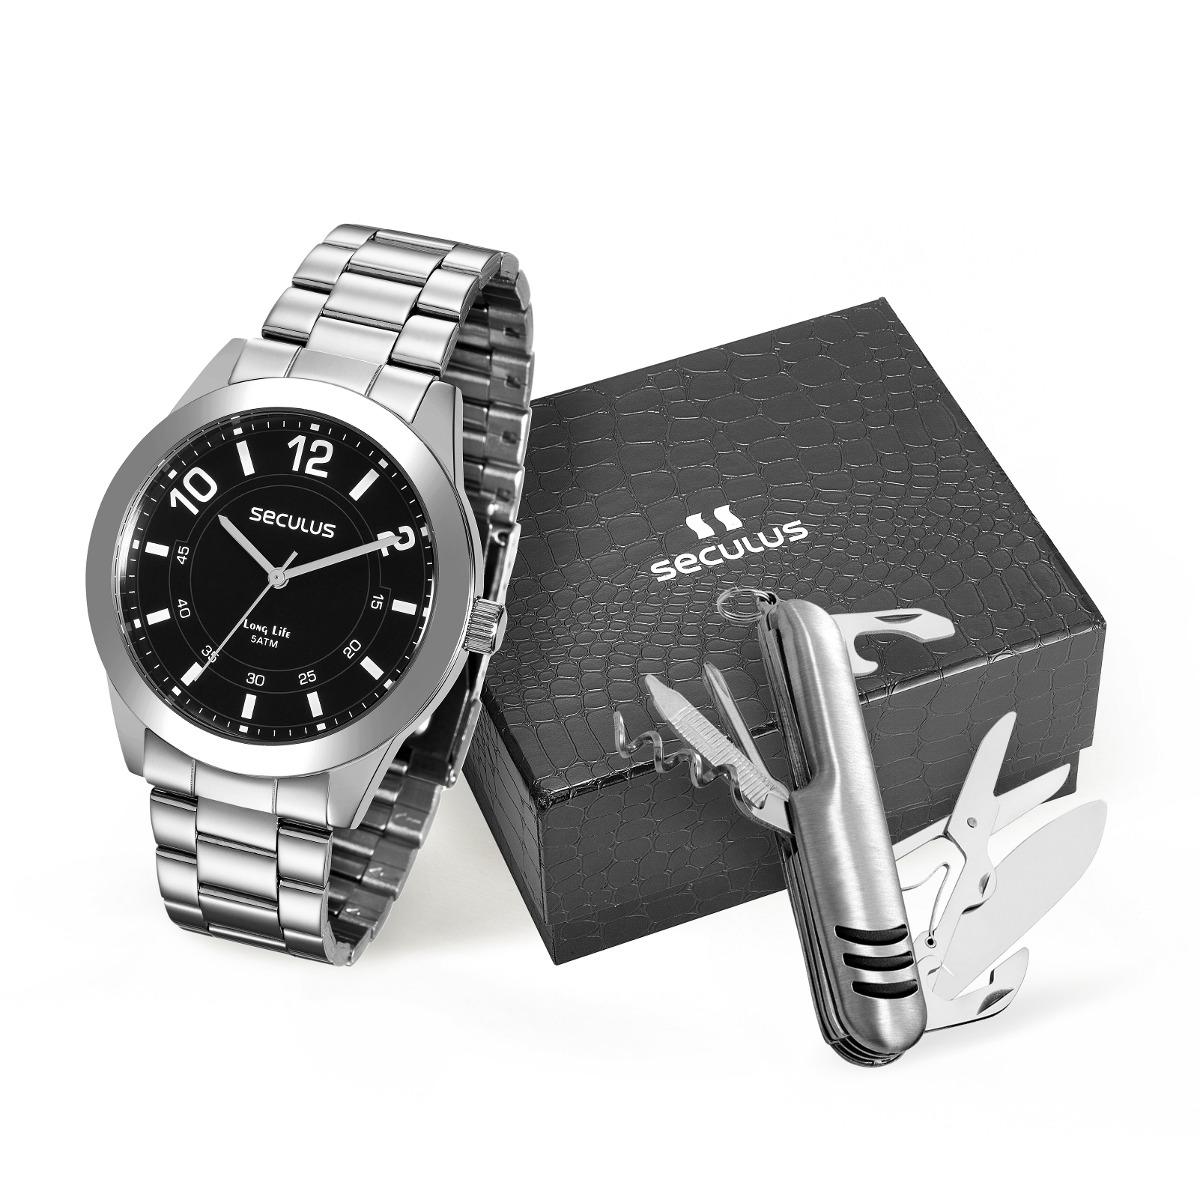 08f30e4b3b6 kit relógio seculus masculino 28883g0svna1k1+ canivete. Carregando zoom.